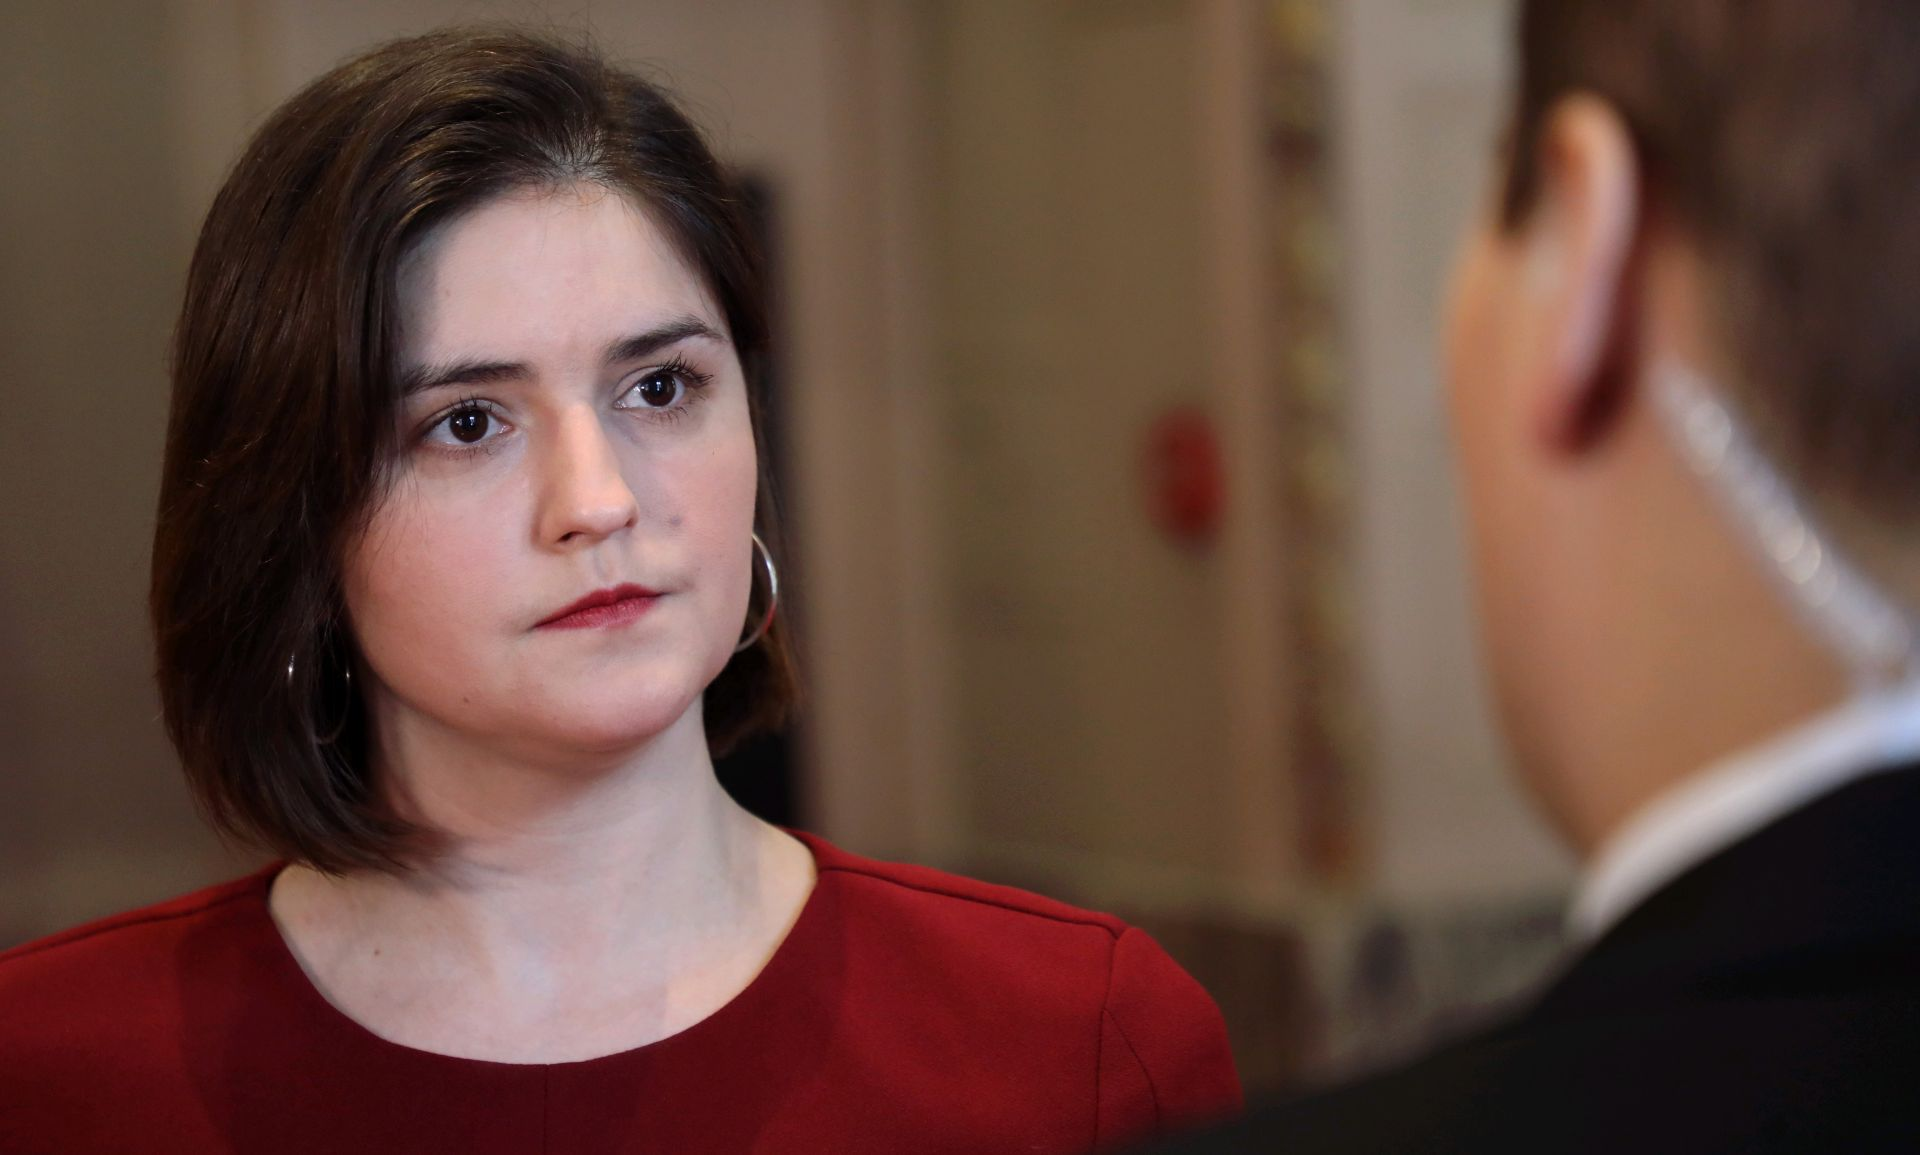 Puh upozorila na govor mržnje zbog Istanbulske konvencije